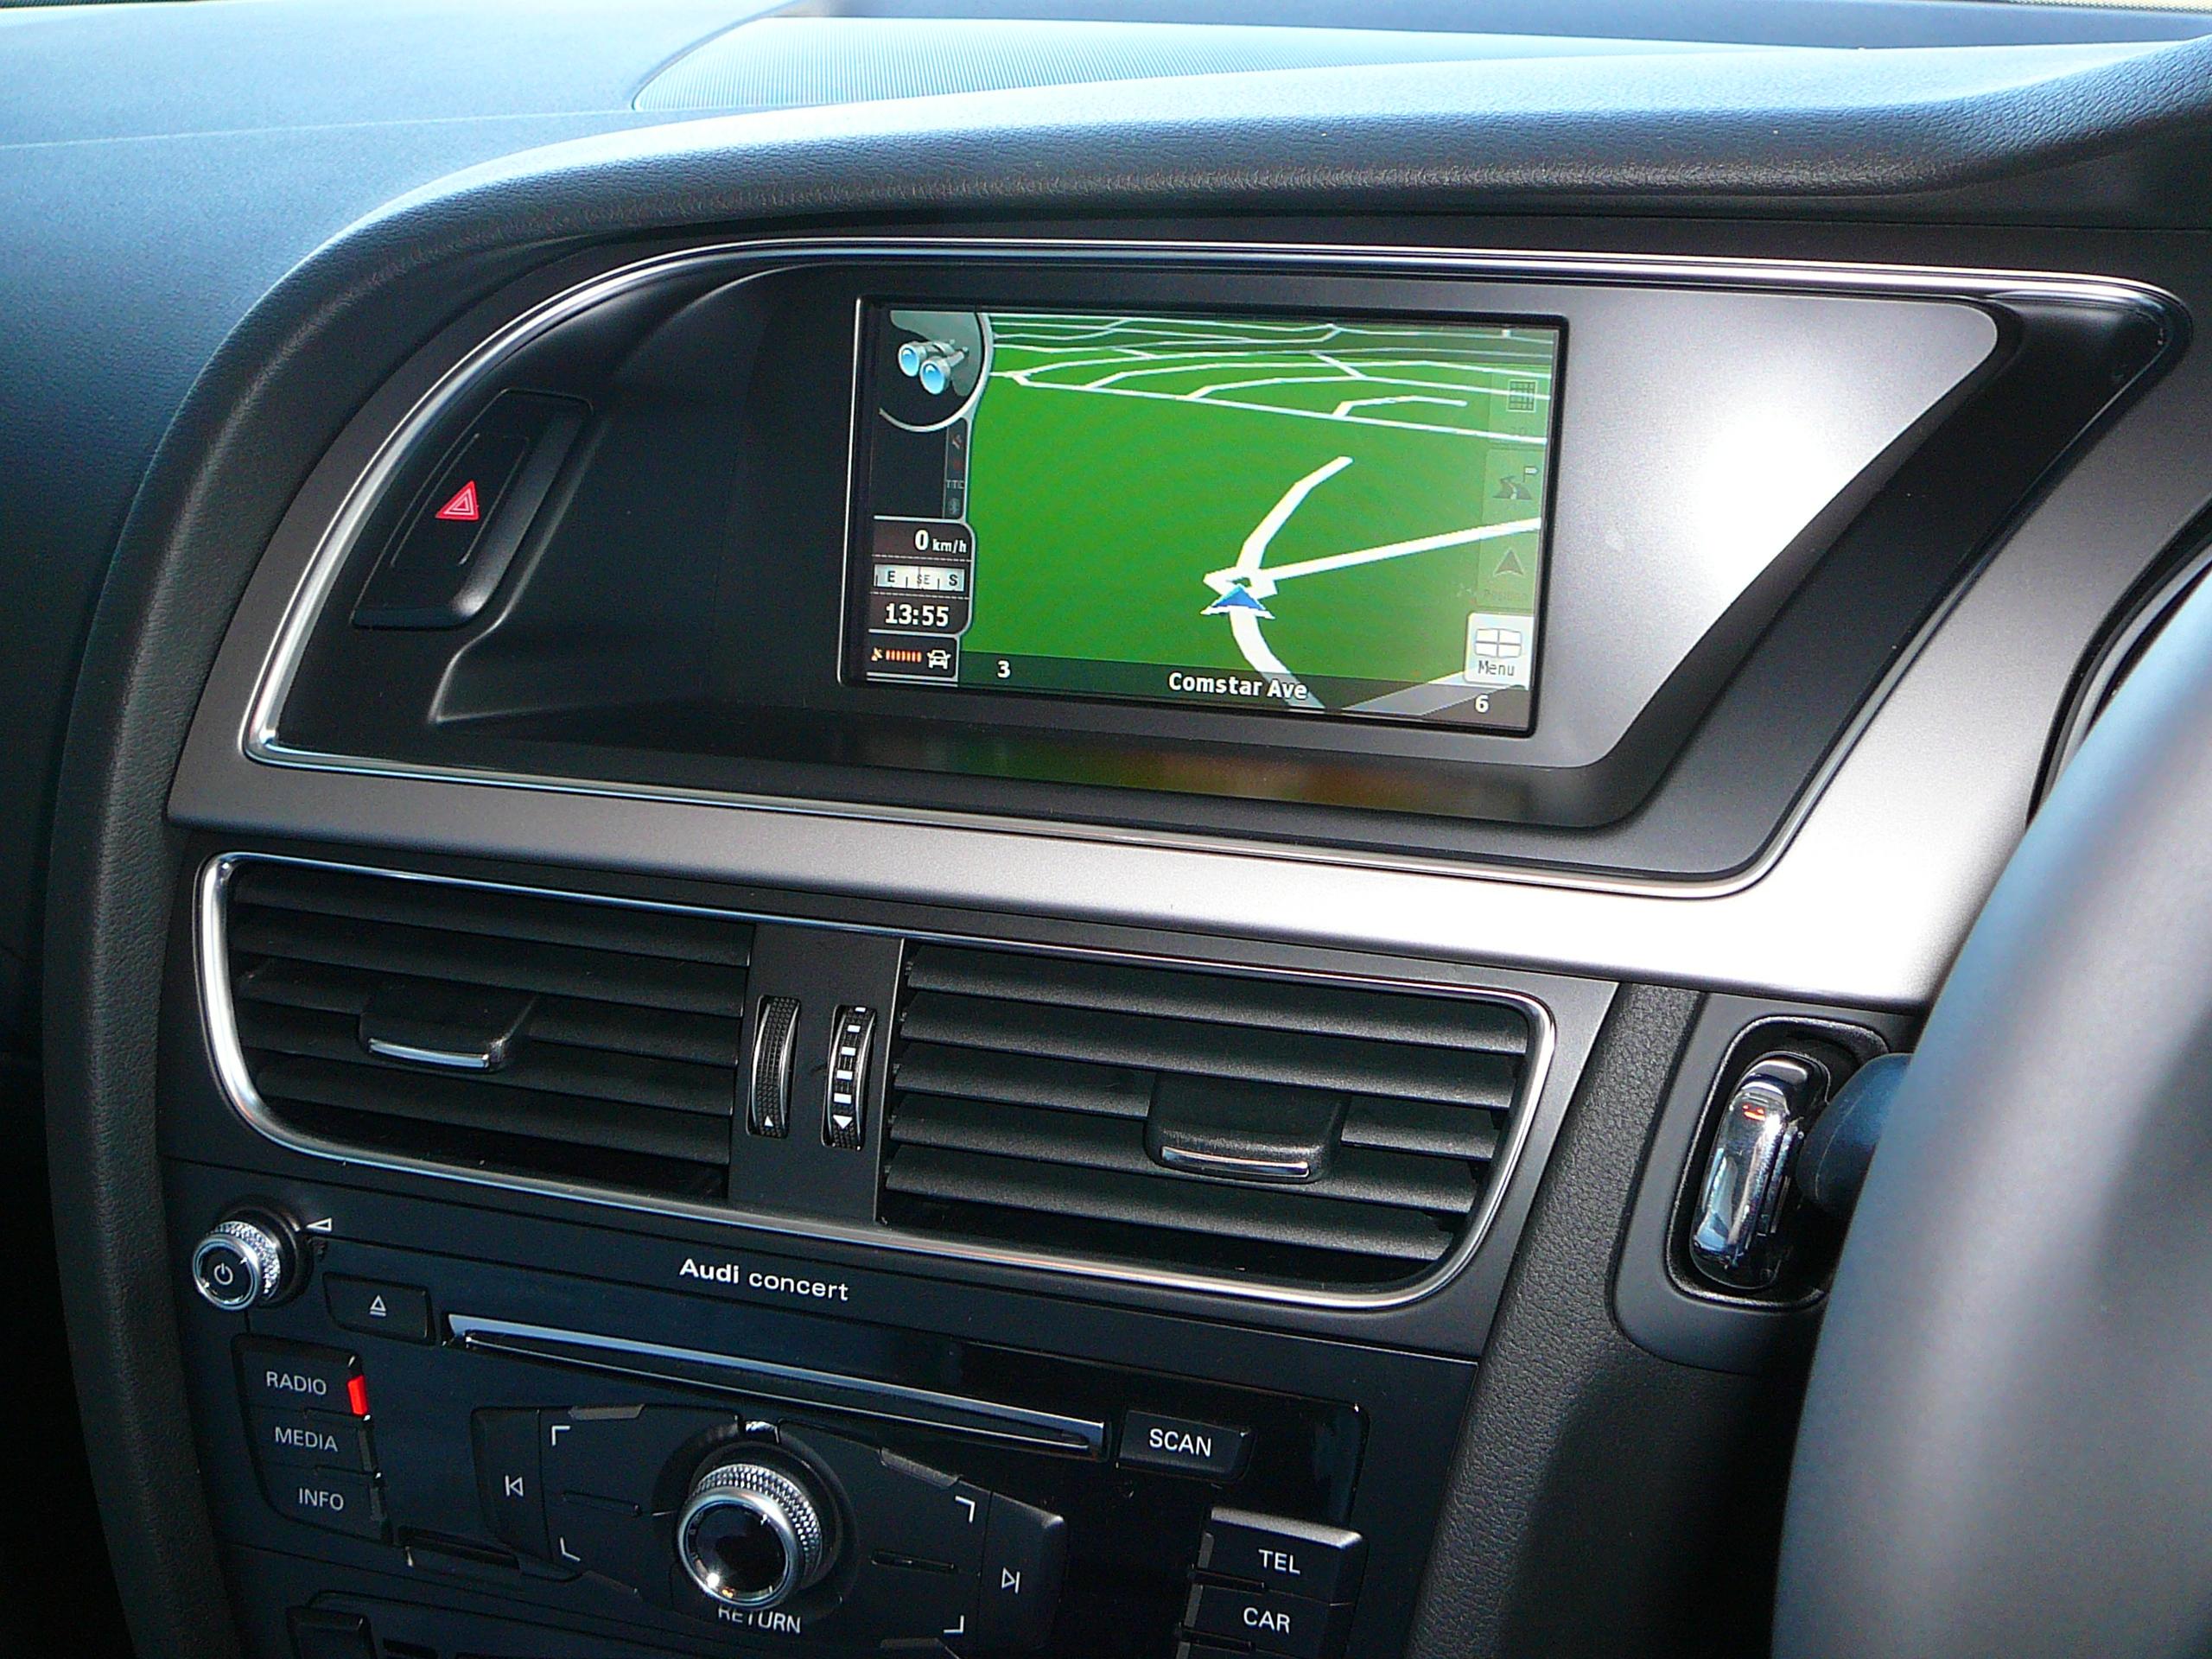 Audi A5 2013 Sportback, Touch Screen Navigation & Camera